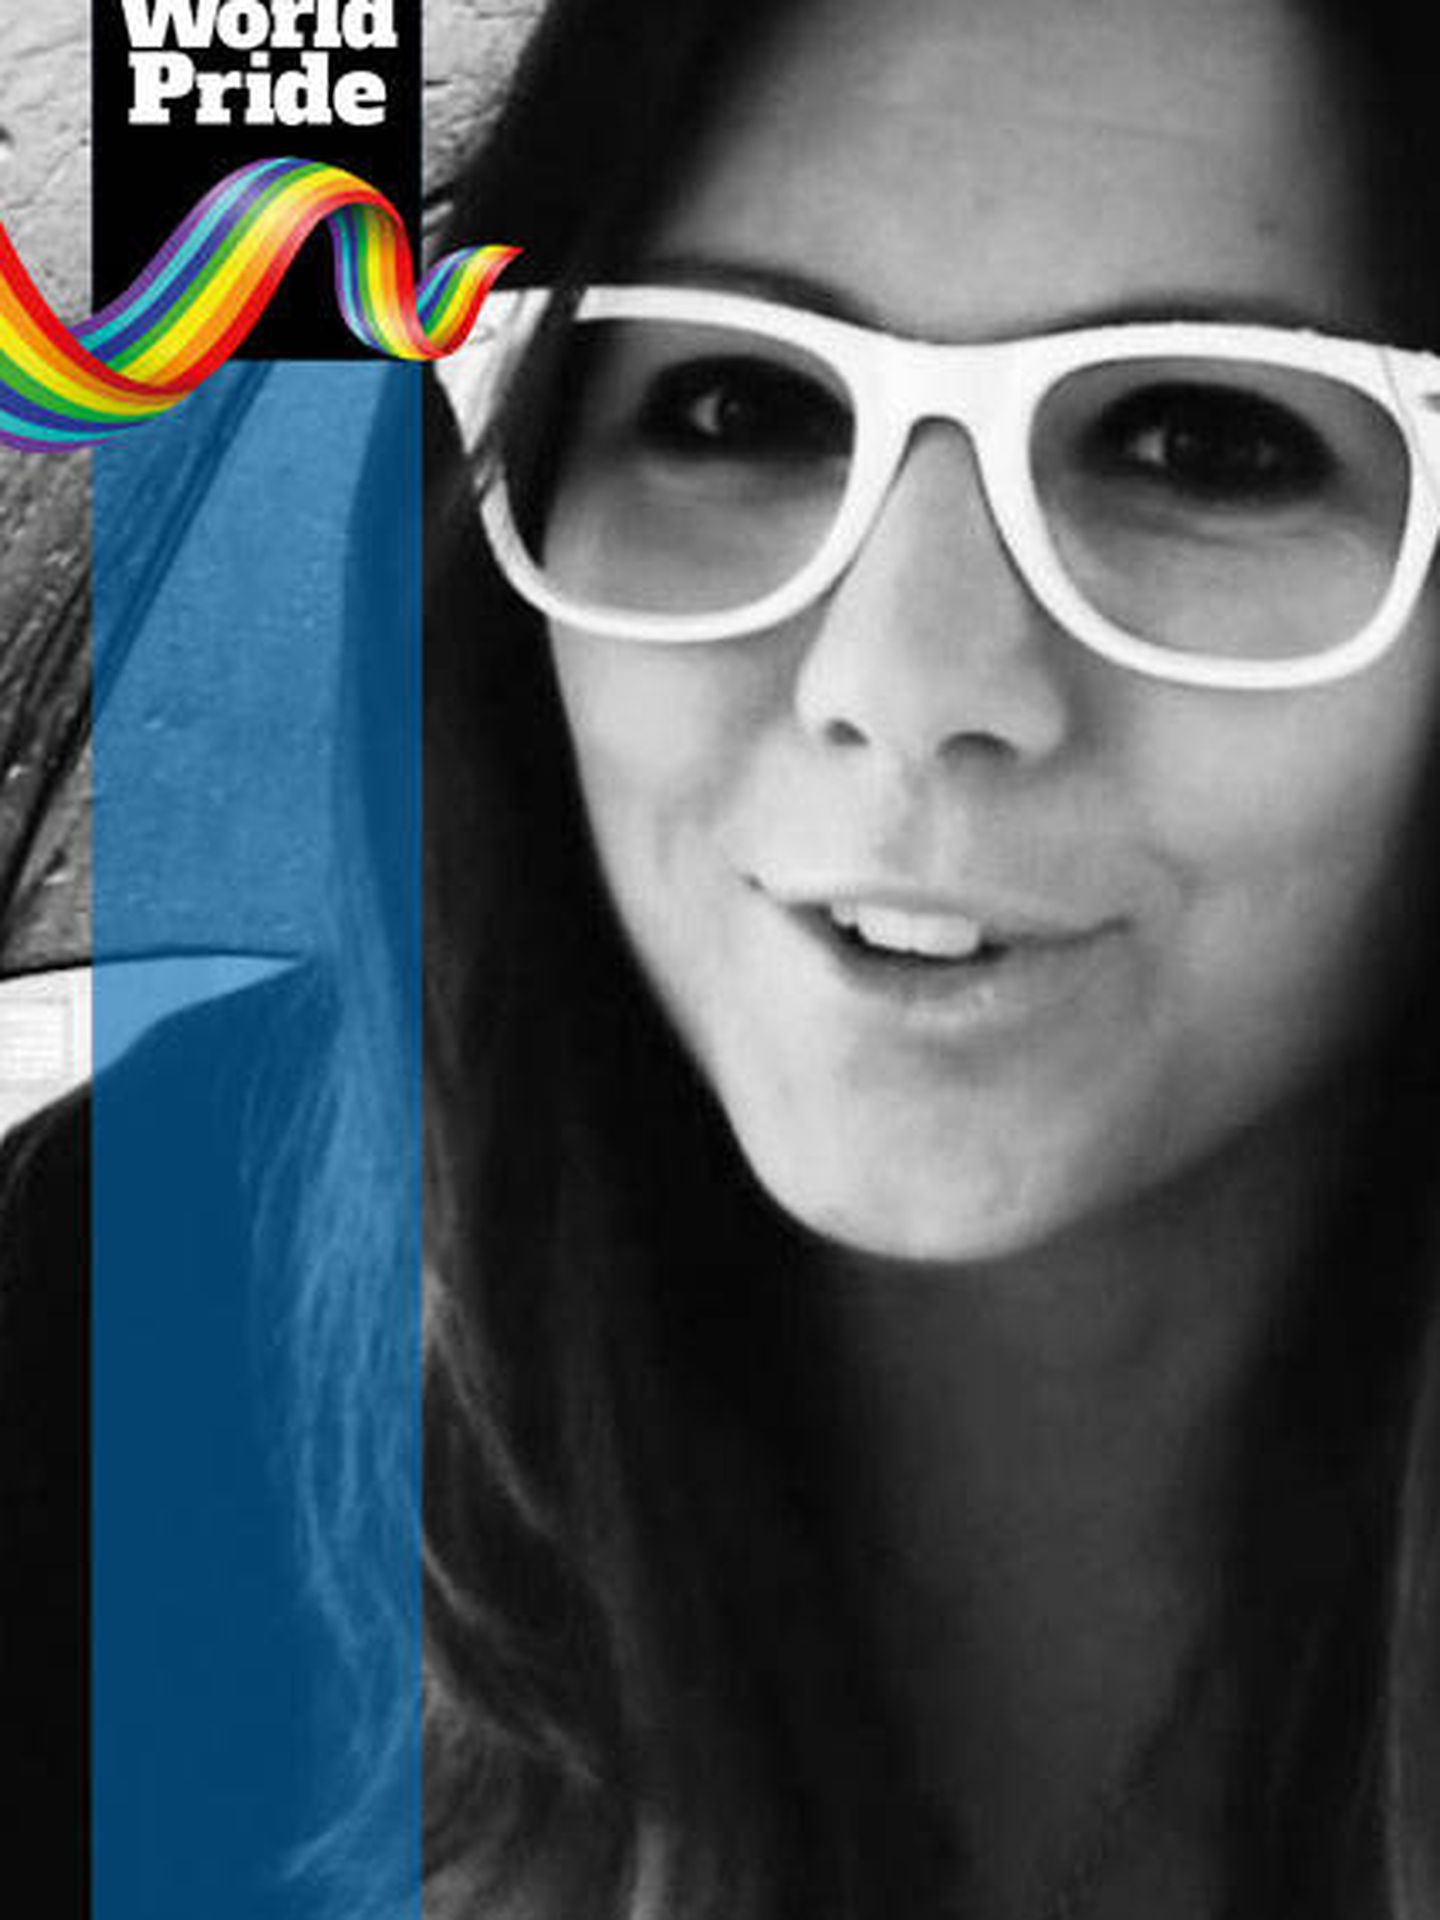 Orgullo LGTBI 2017: Bollicao.